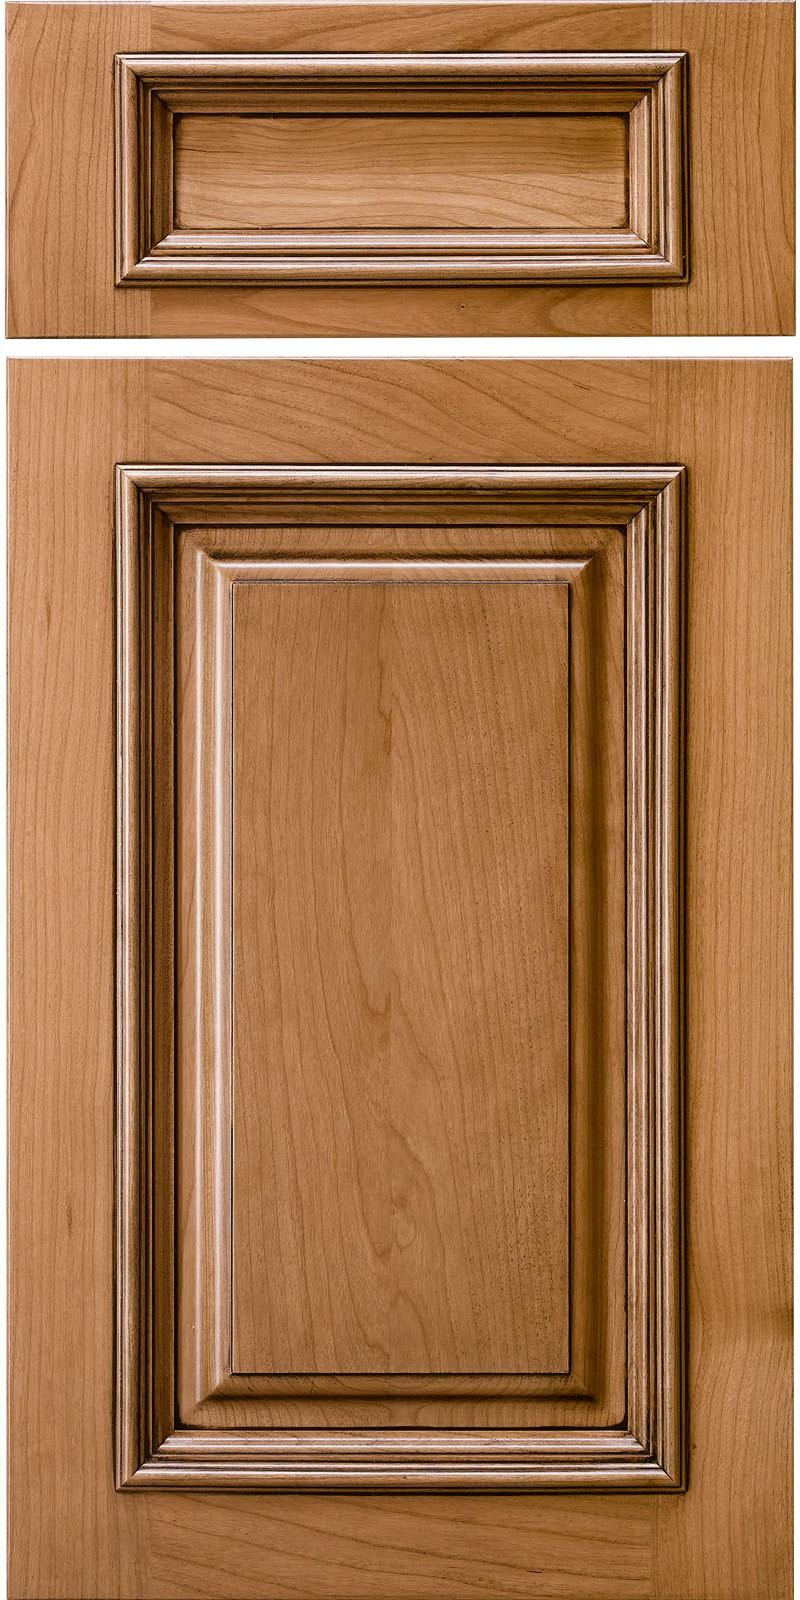 Crp10a48 1 Quot Thick Construction Cabinet Doors